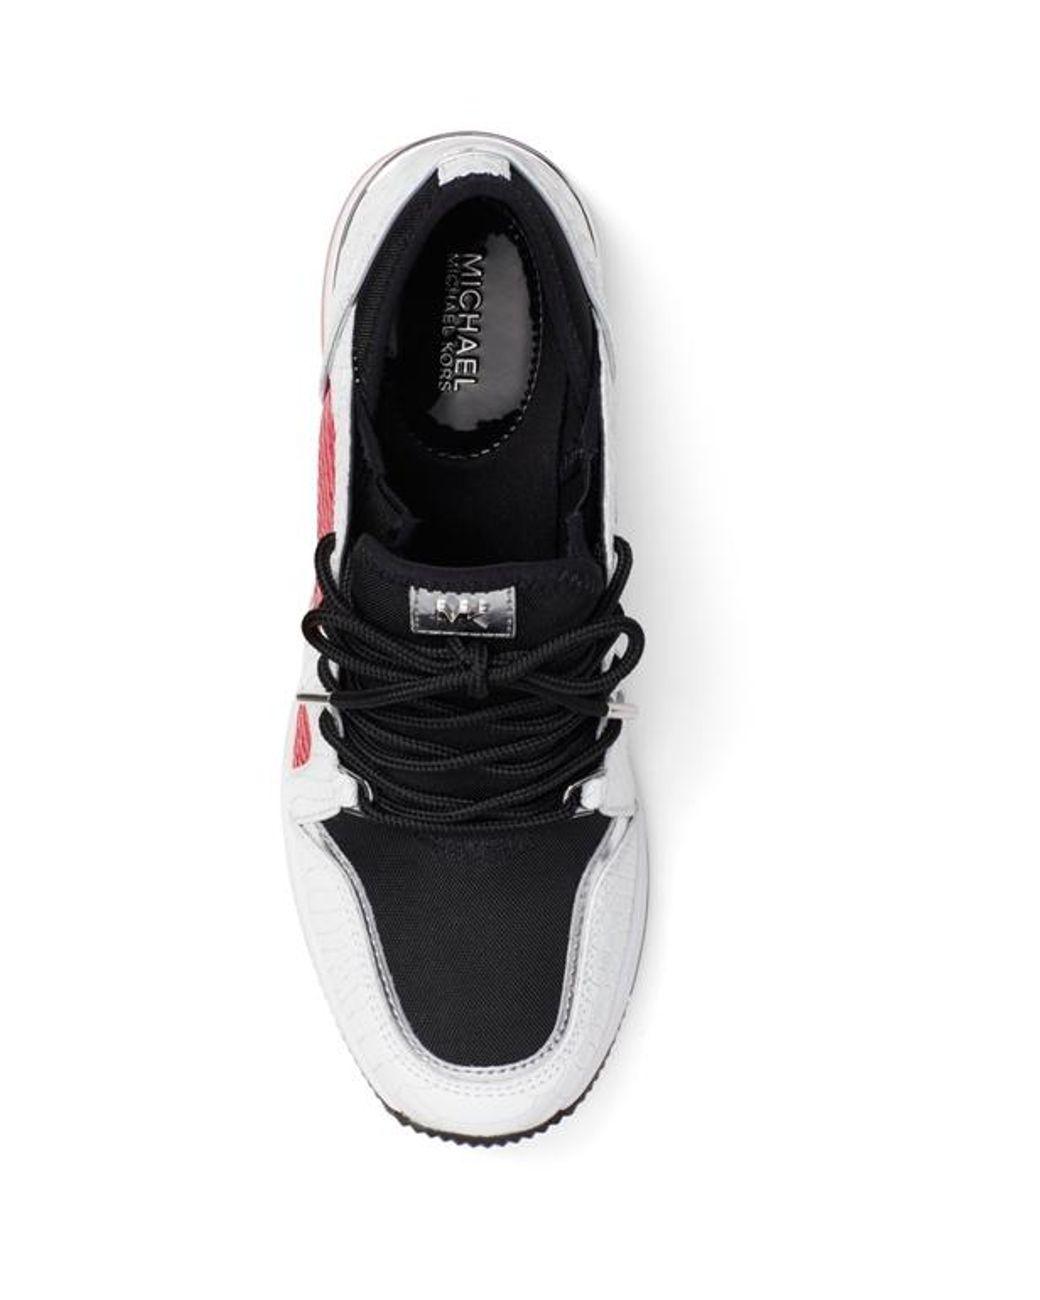 Liv Chaussur Michael Femme Kors Sneaker 7g6bfy